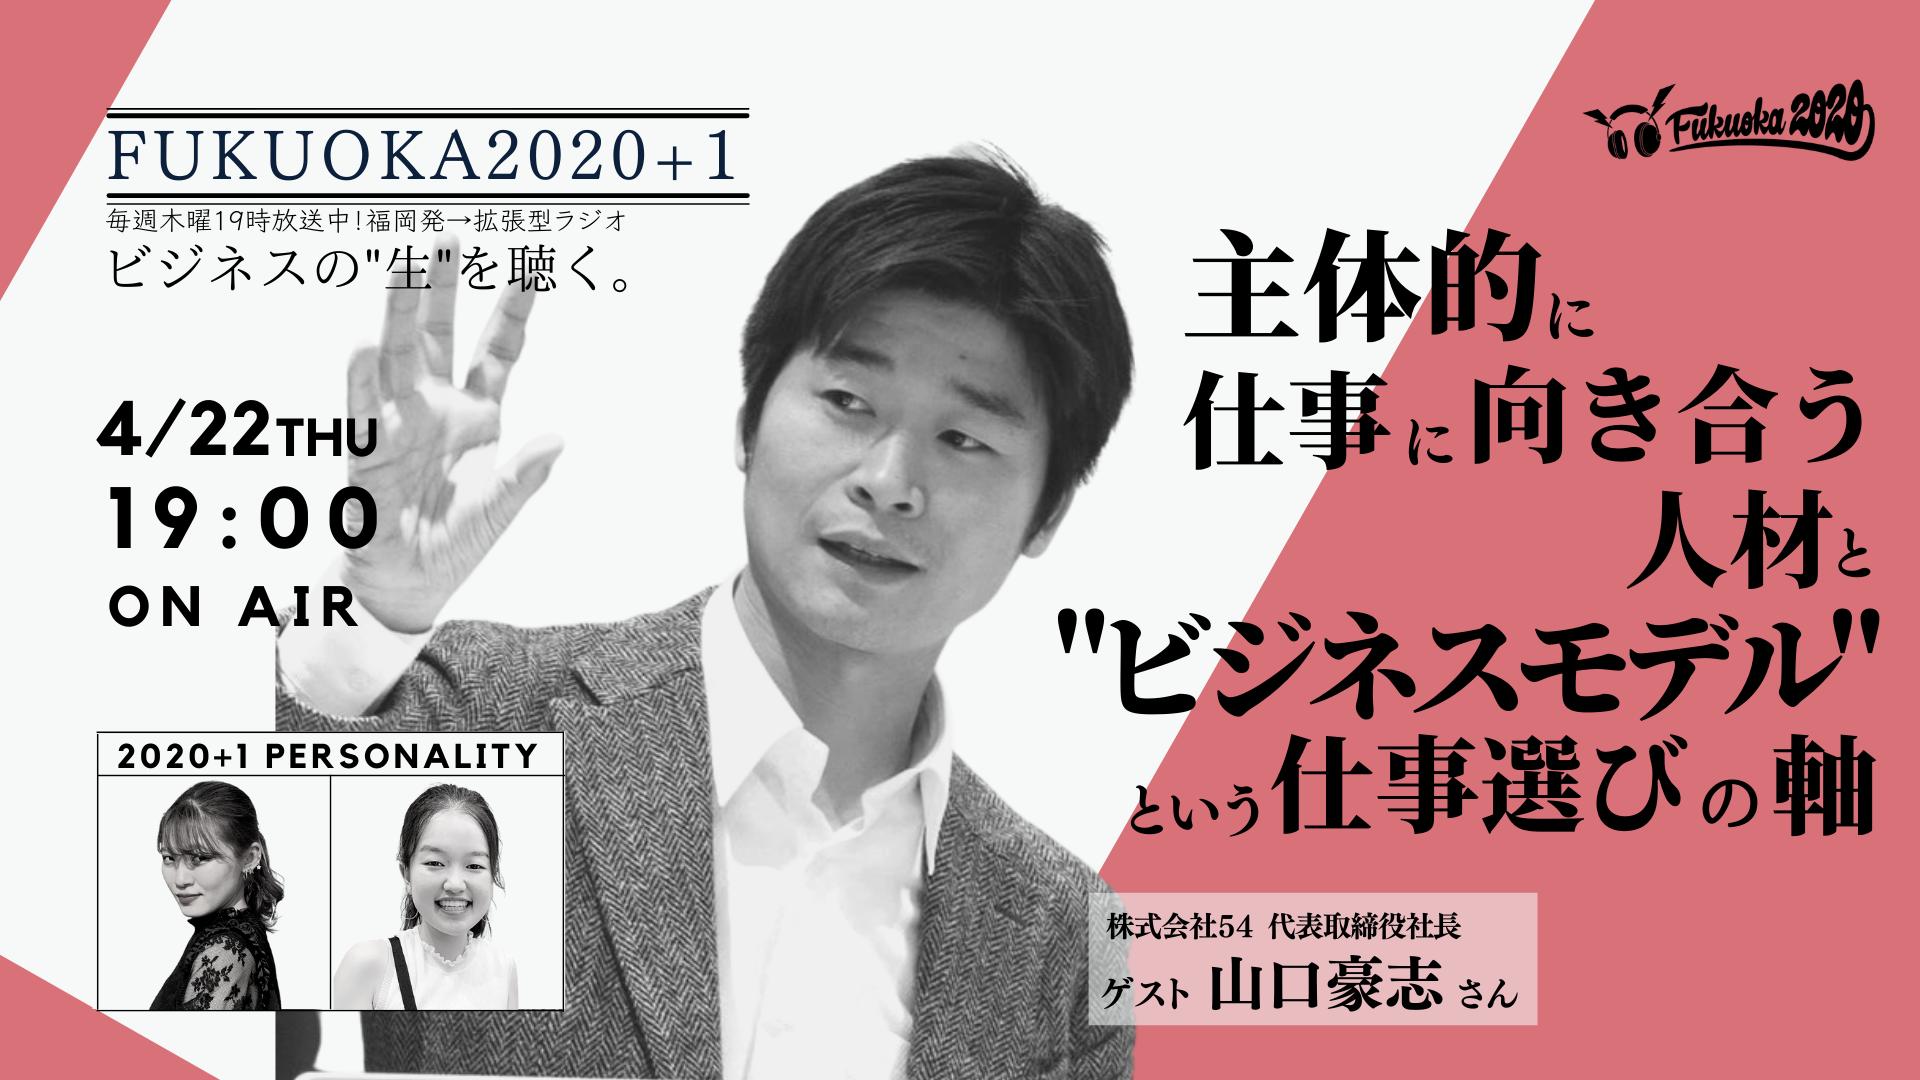 【LIVE】FUKUOKA2020 vol.134 |ゲスト: 株式会社54 代表取締役社長 山口豪志さん